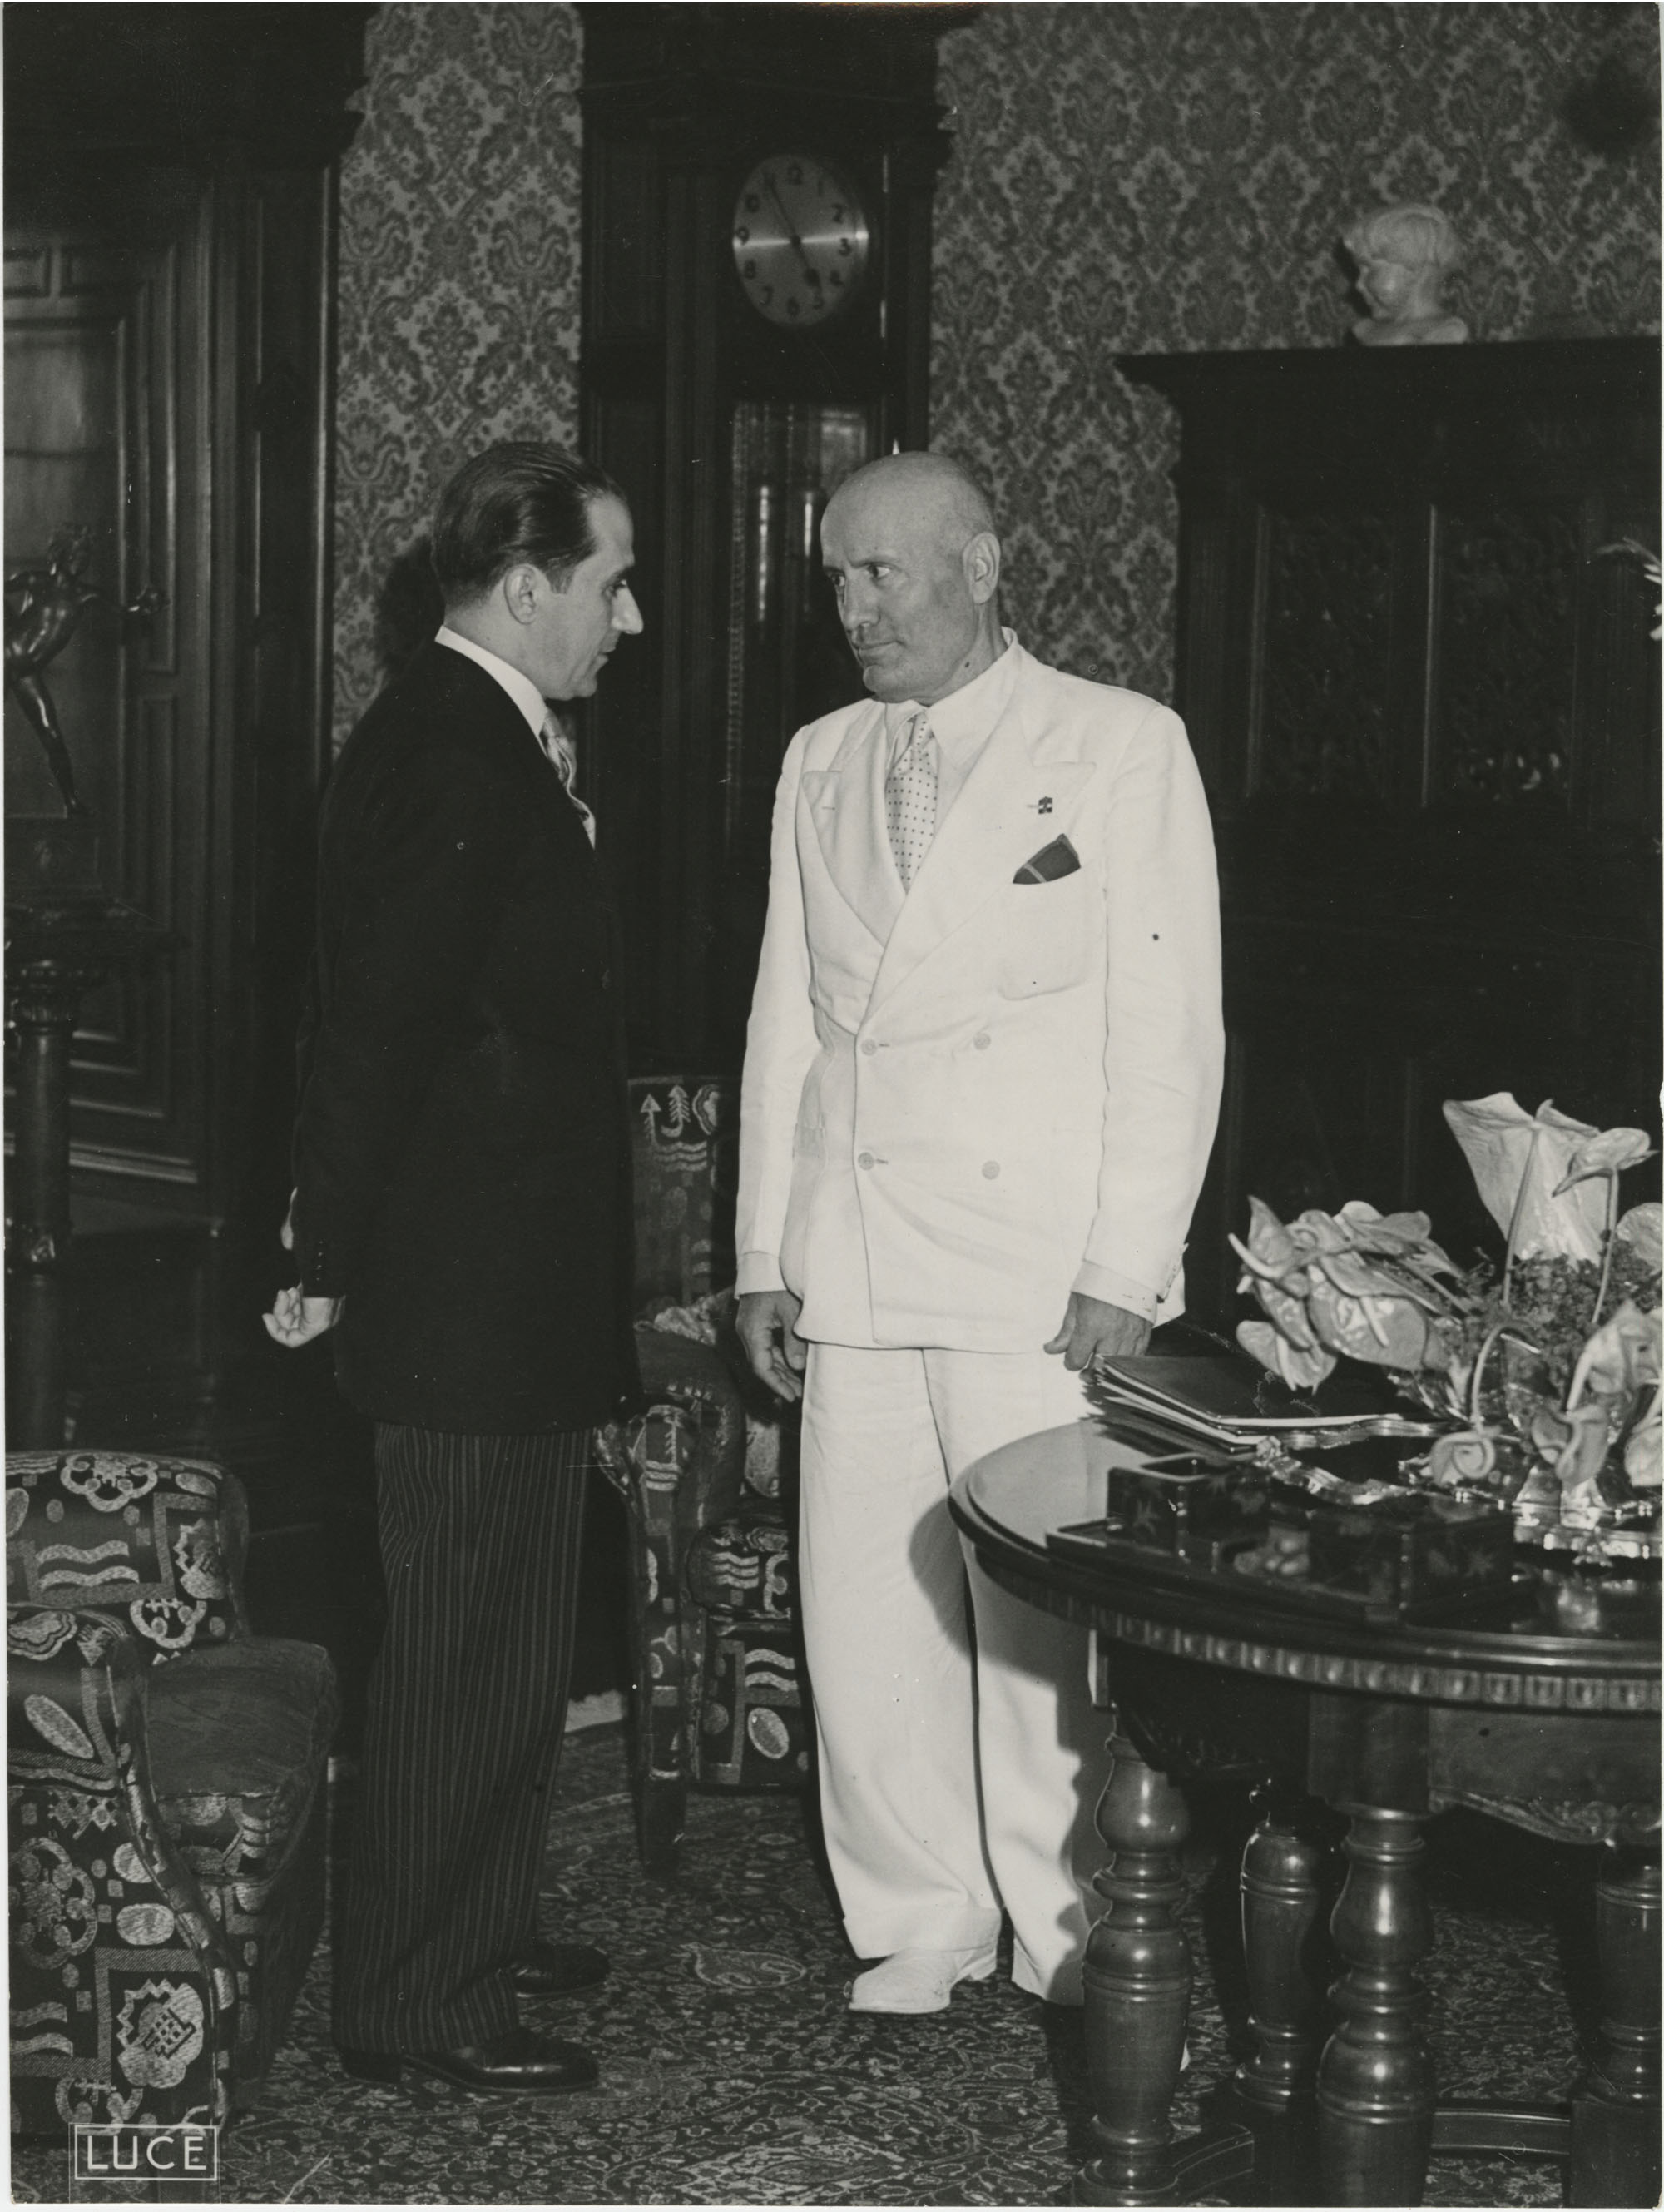 Mihai Antonescu's visit to Benito Mussolini, Photograph 34